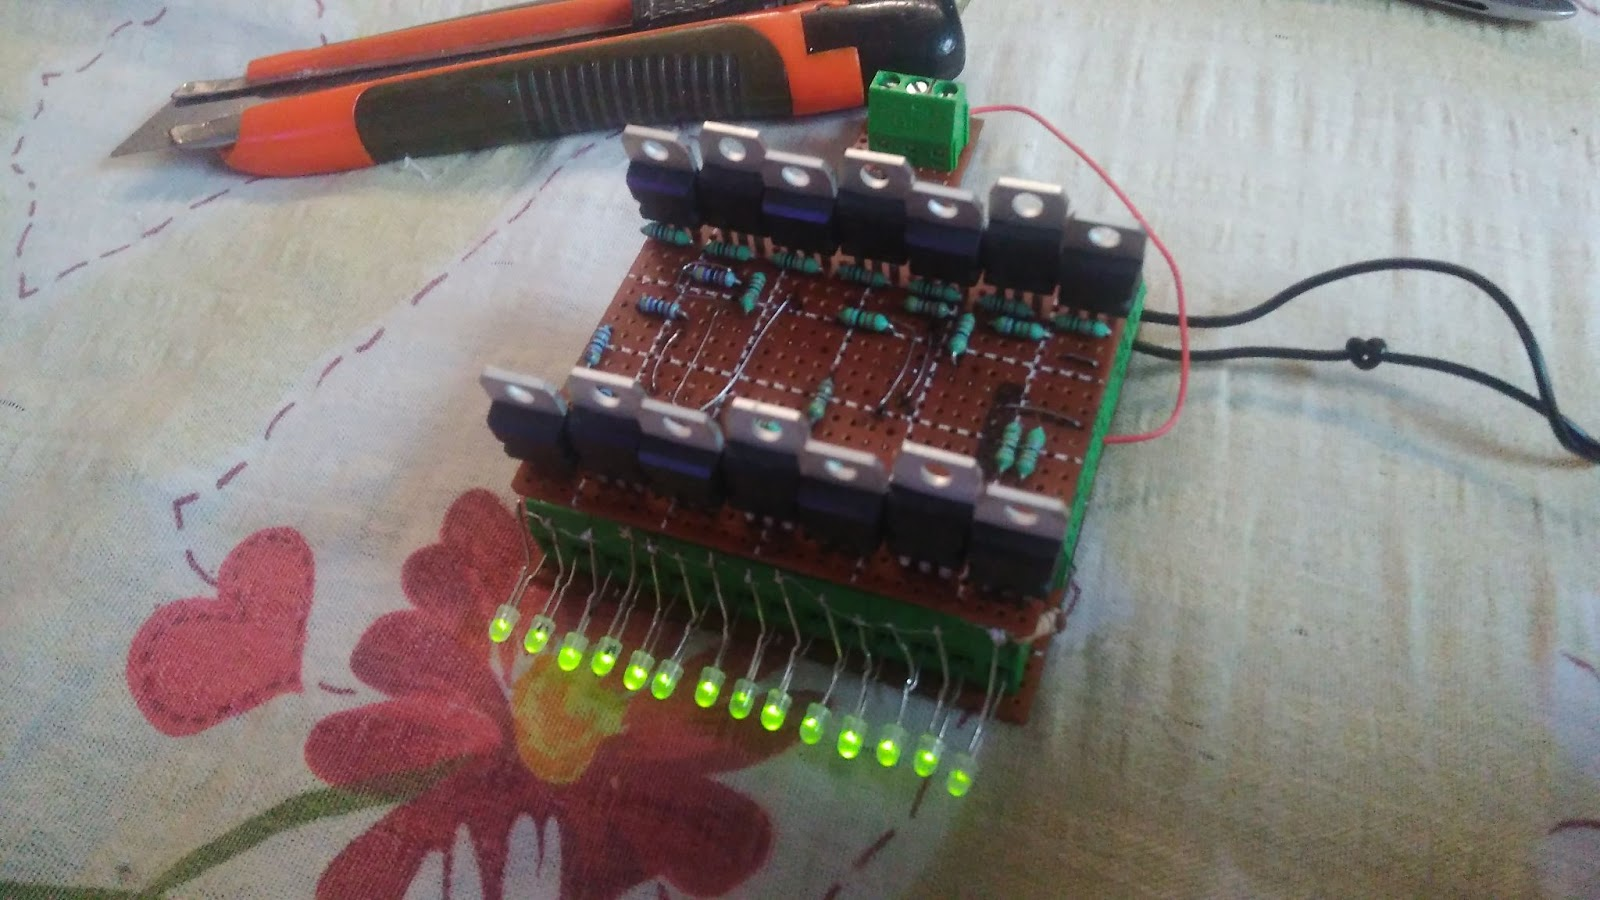 Nicu Florica Niq Ro Scari Luminate Inteligent Circuit Pic16f628 Rf Remote Buton 433mhz Button Ps Aici Este Fisierul Hex Pentru Atmega8a Cu Oscilator Intern Ps2 Am Realizat Si Eu Un Montaj Scris Programior 16 Trepte Functionare